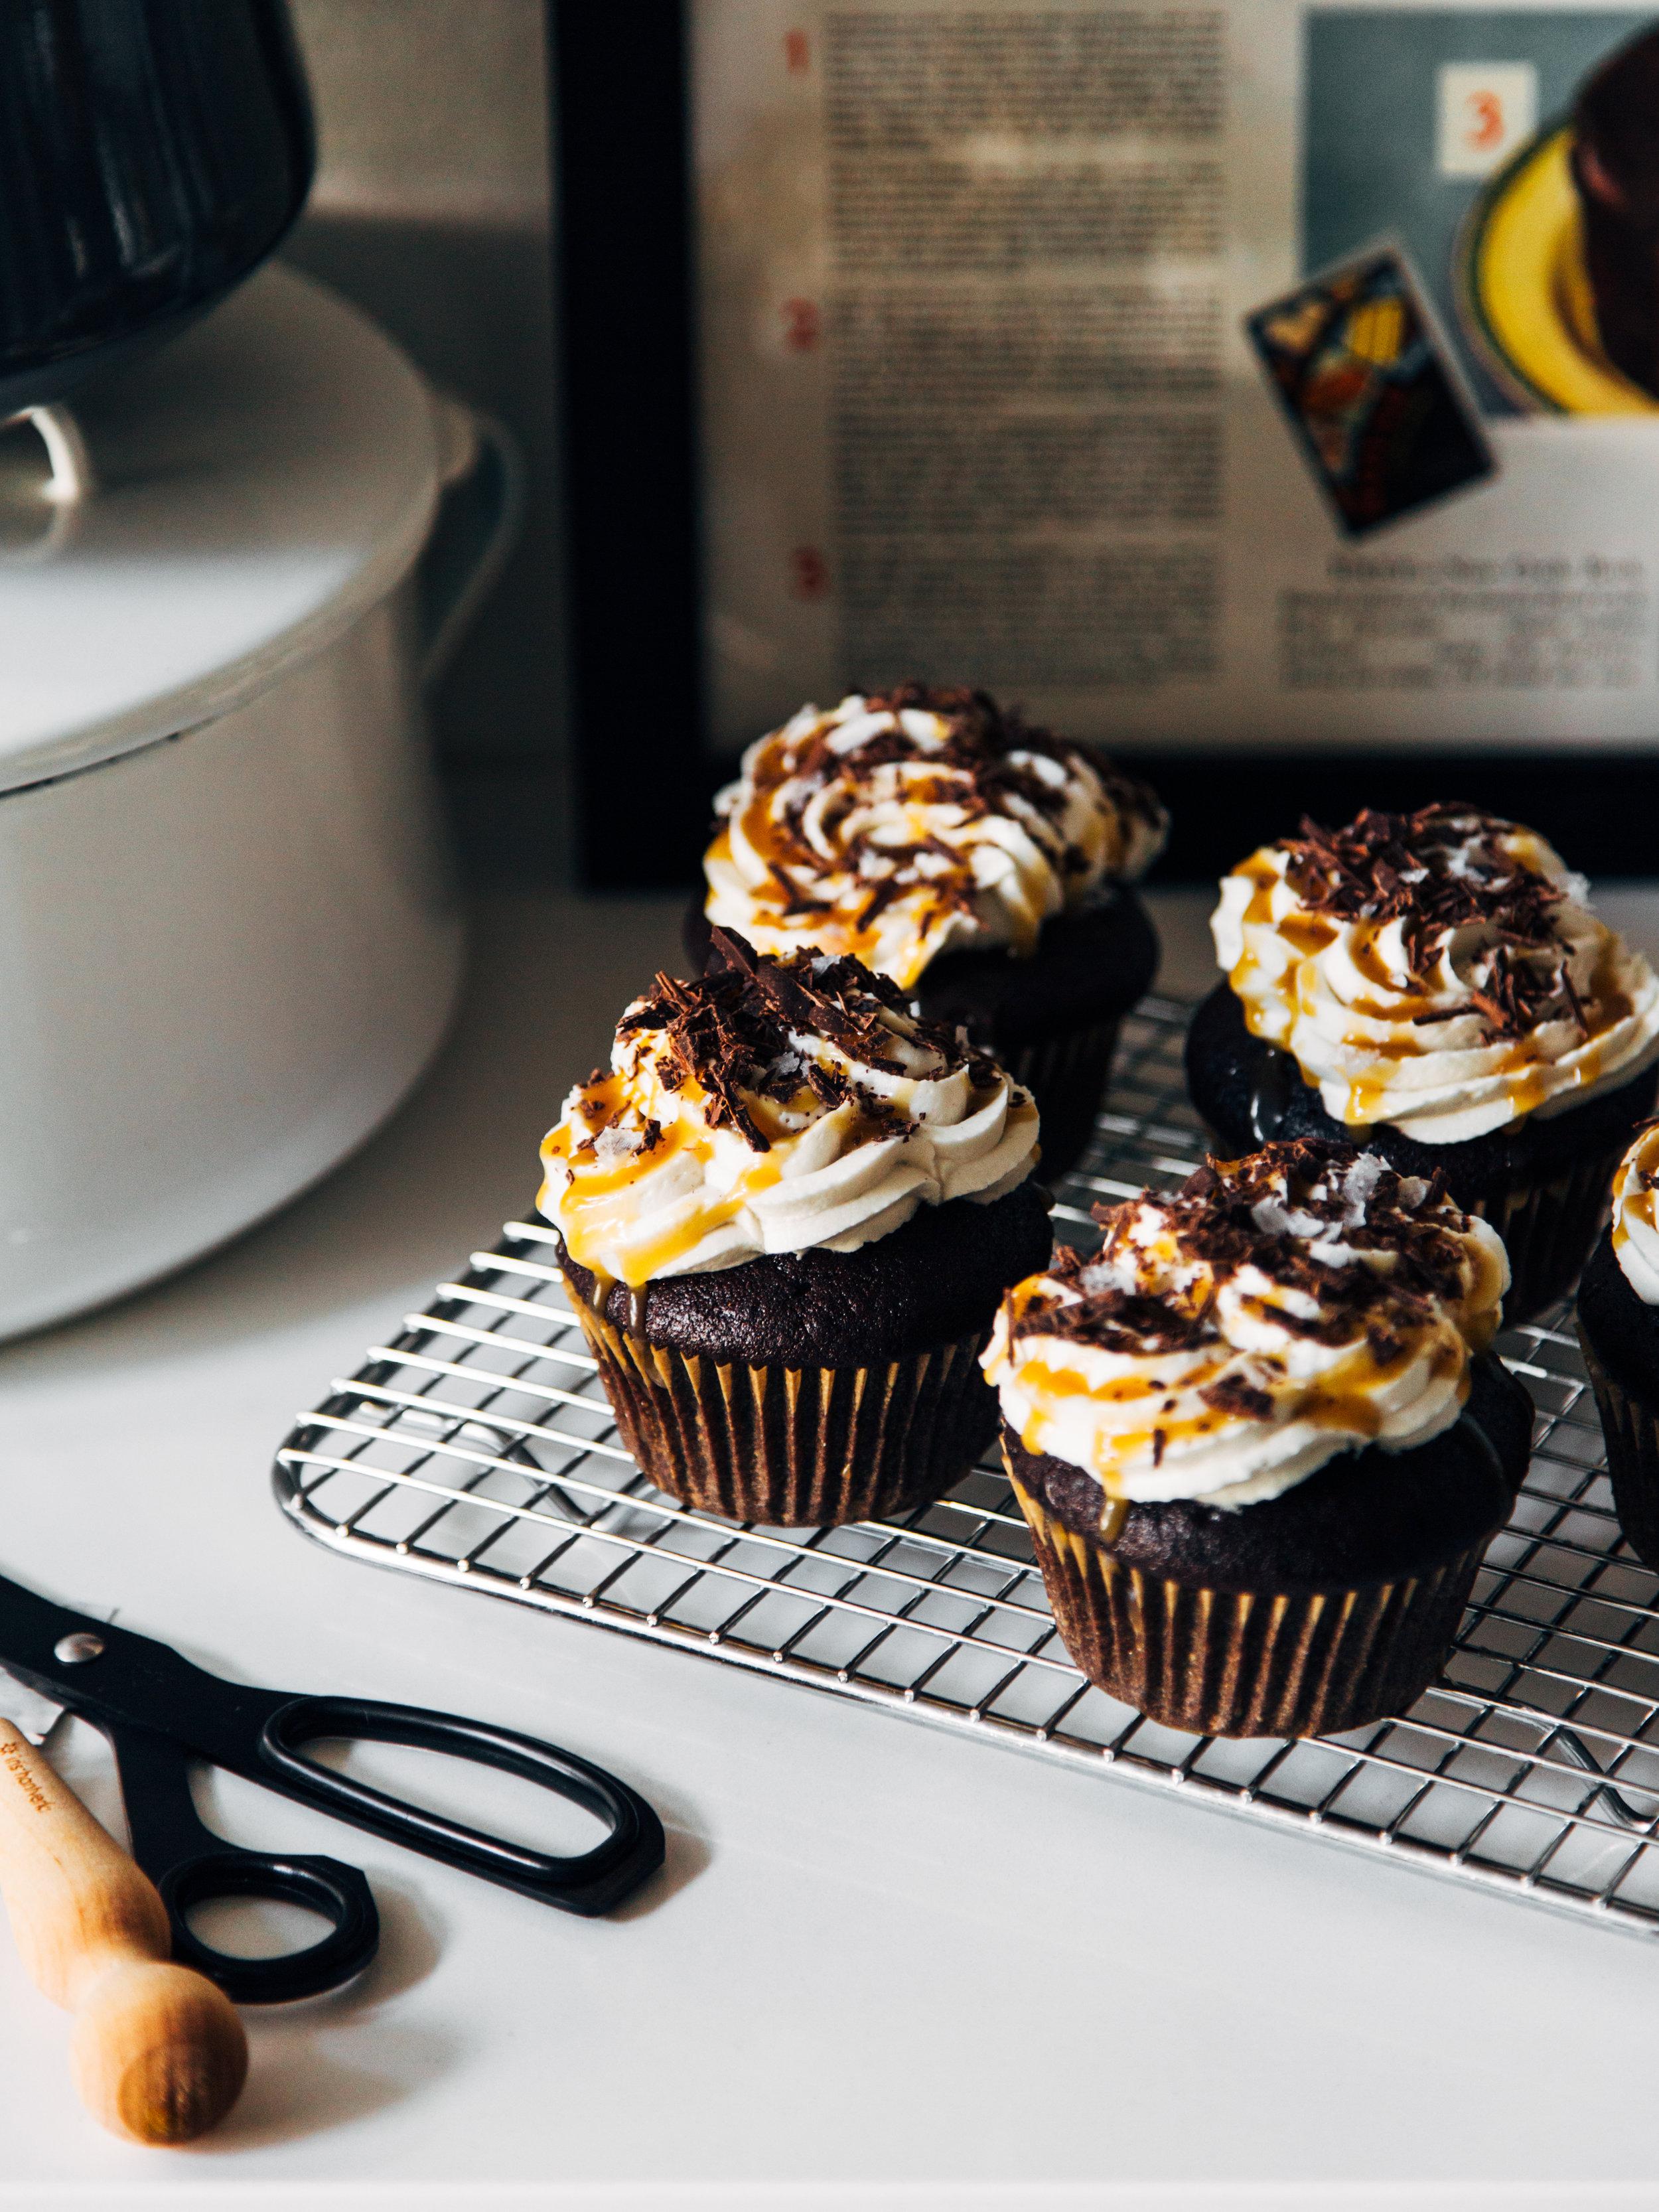 adventure cake-cupcakes